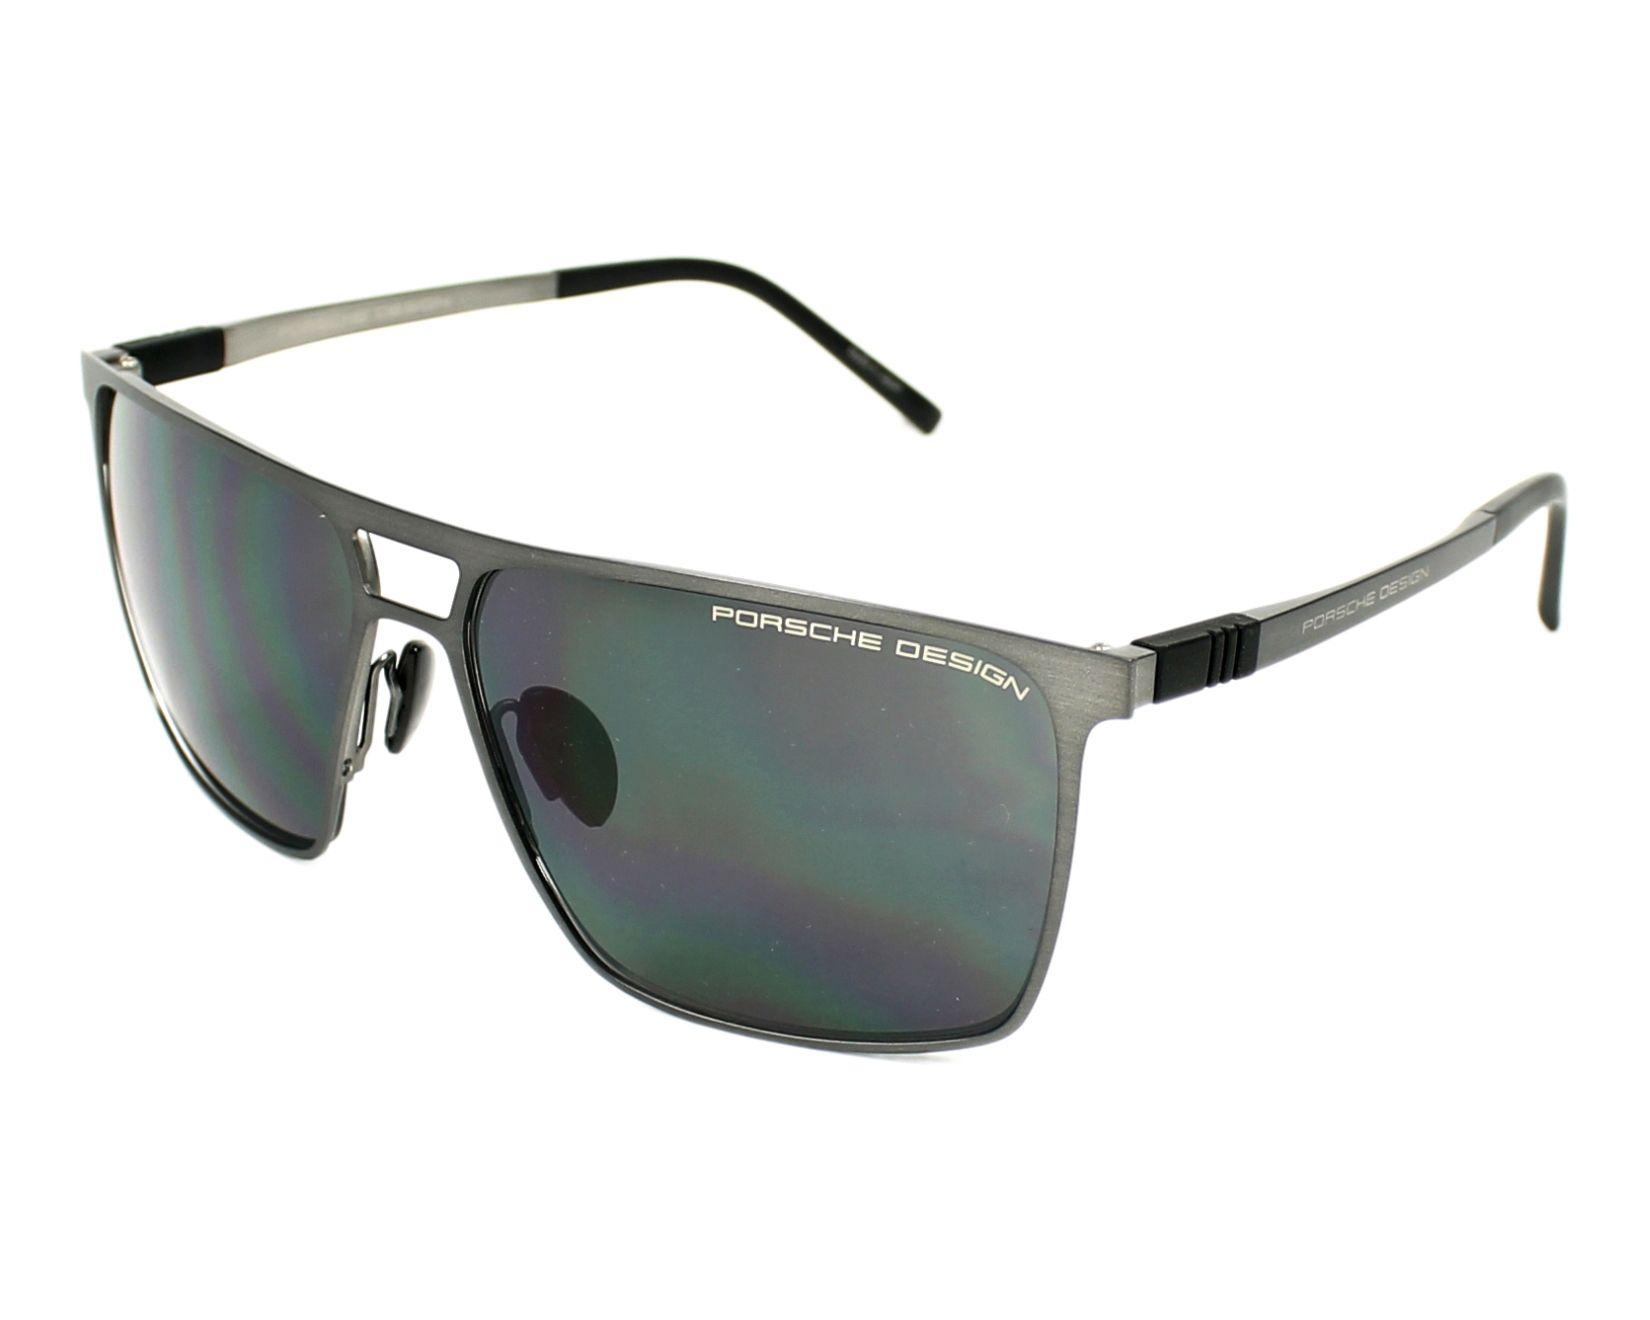 lunettes de soleil porsche design p 8610 b 59 visionet. Black Bedroom Furniture Sets. Home Design Ideas